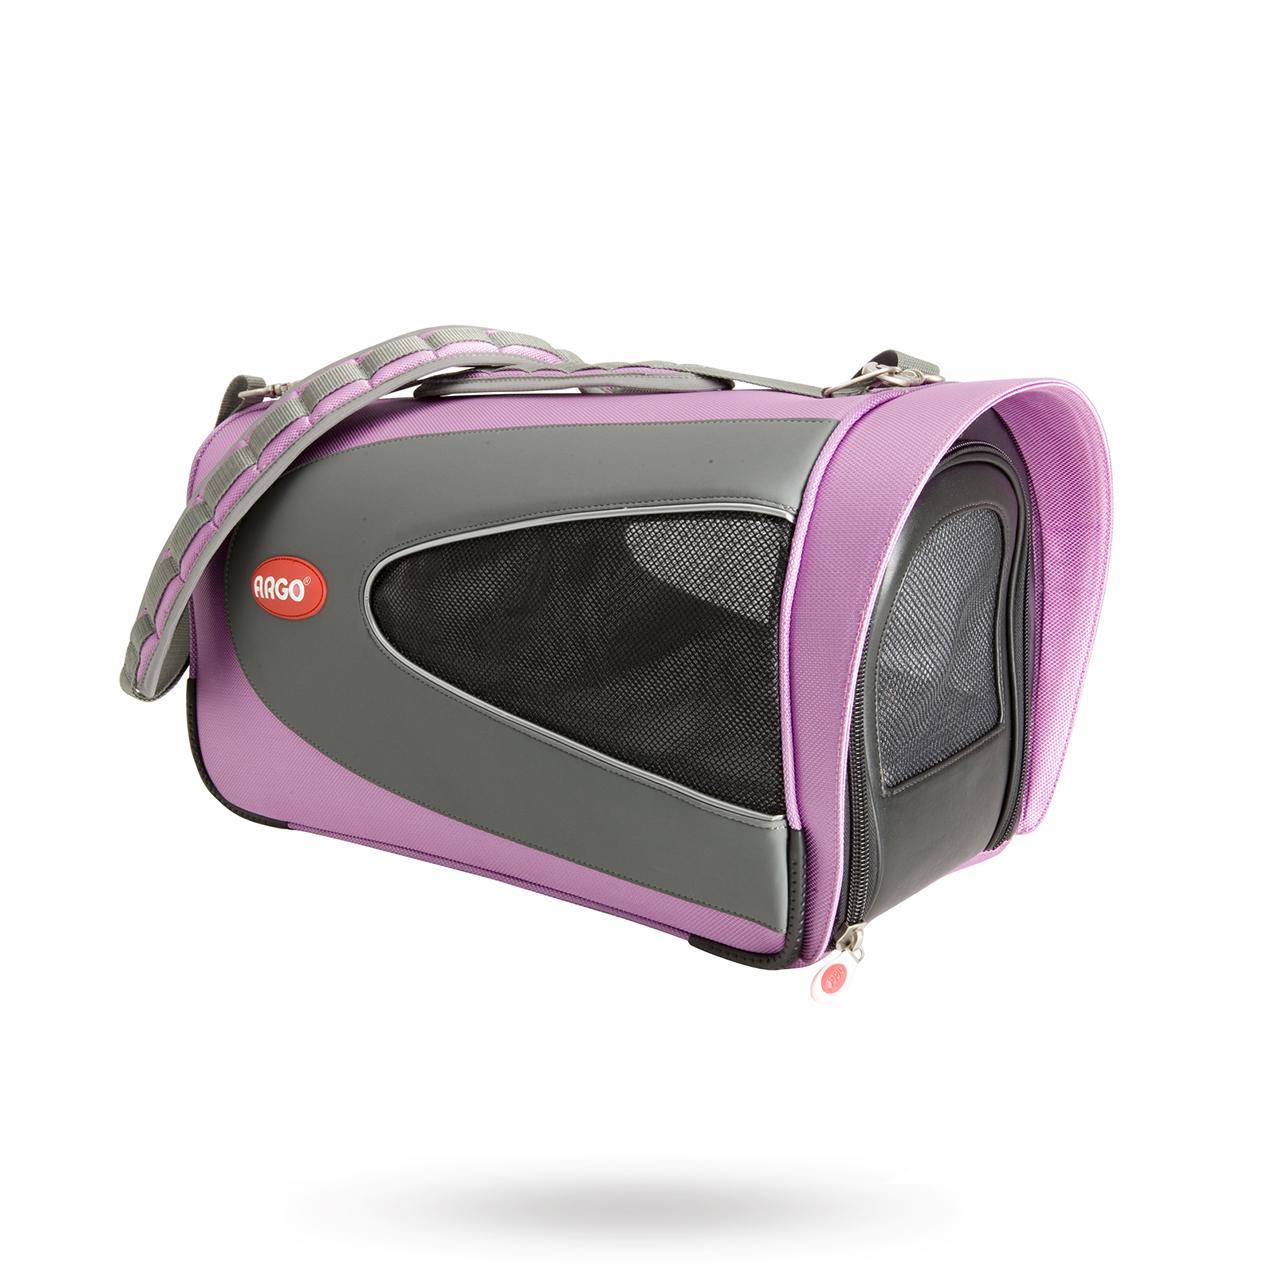 ARGO Petascope Pink - Small